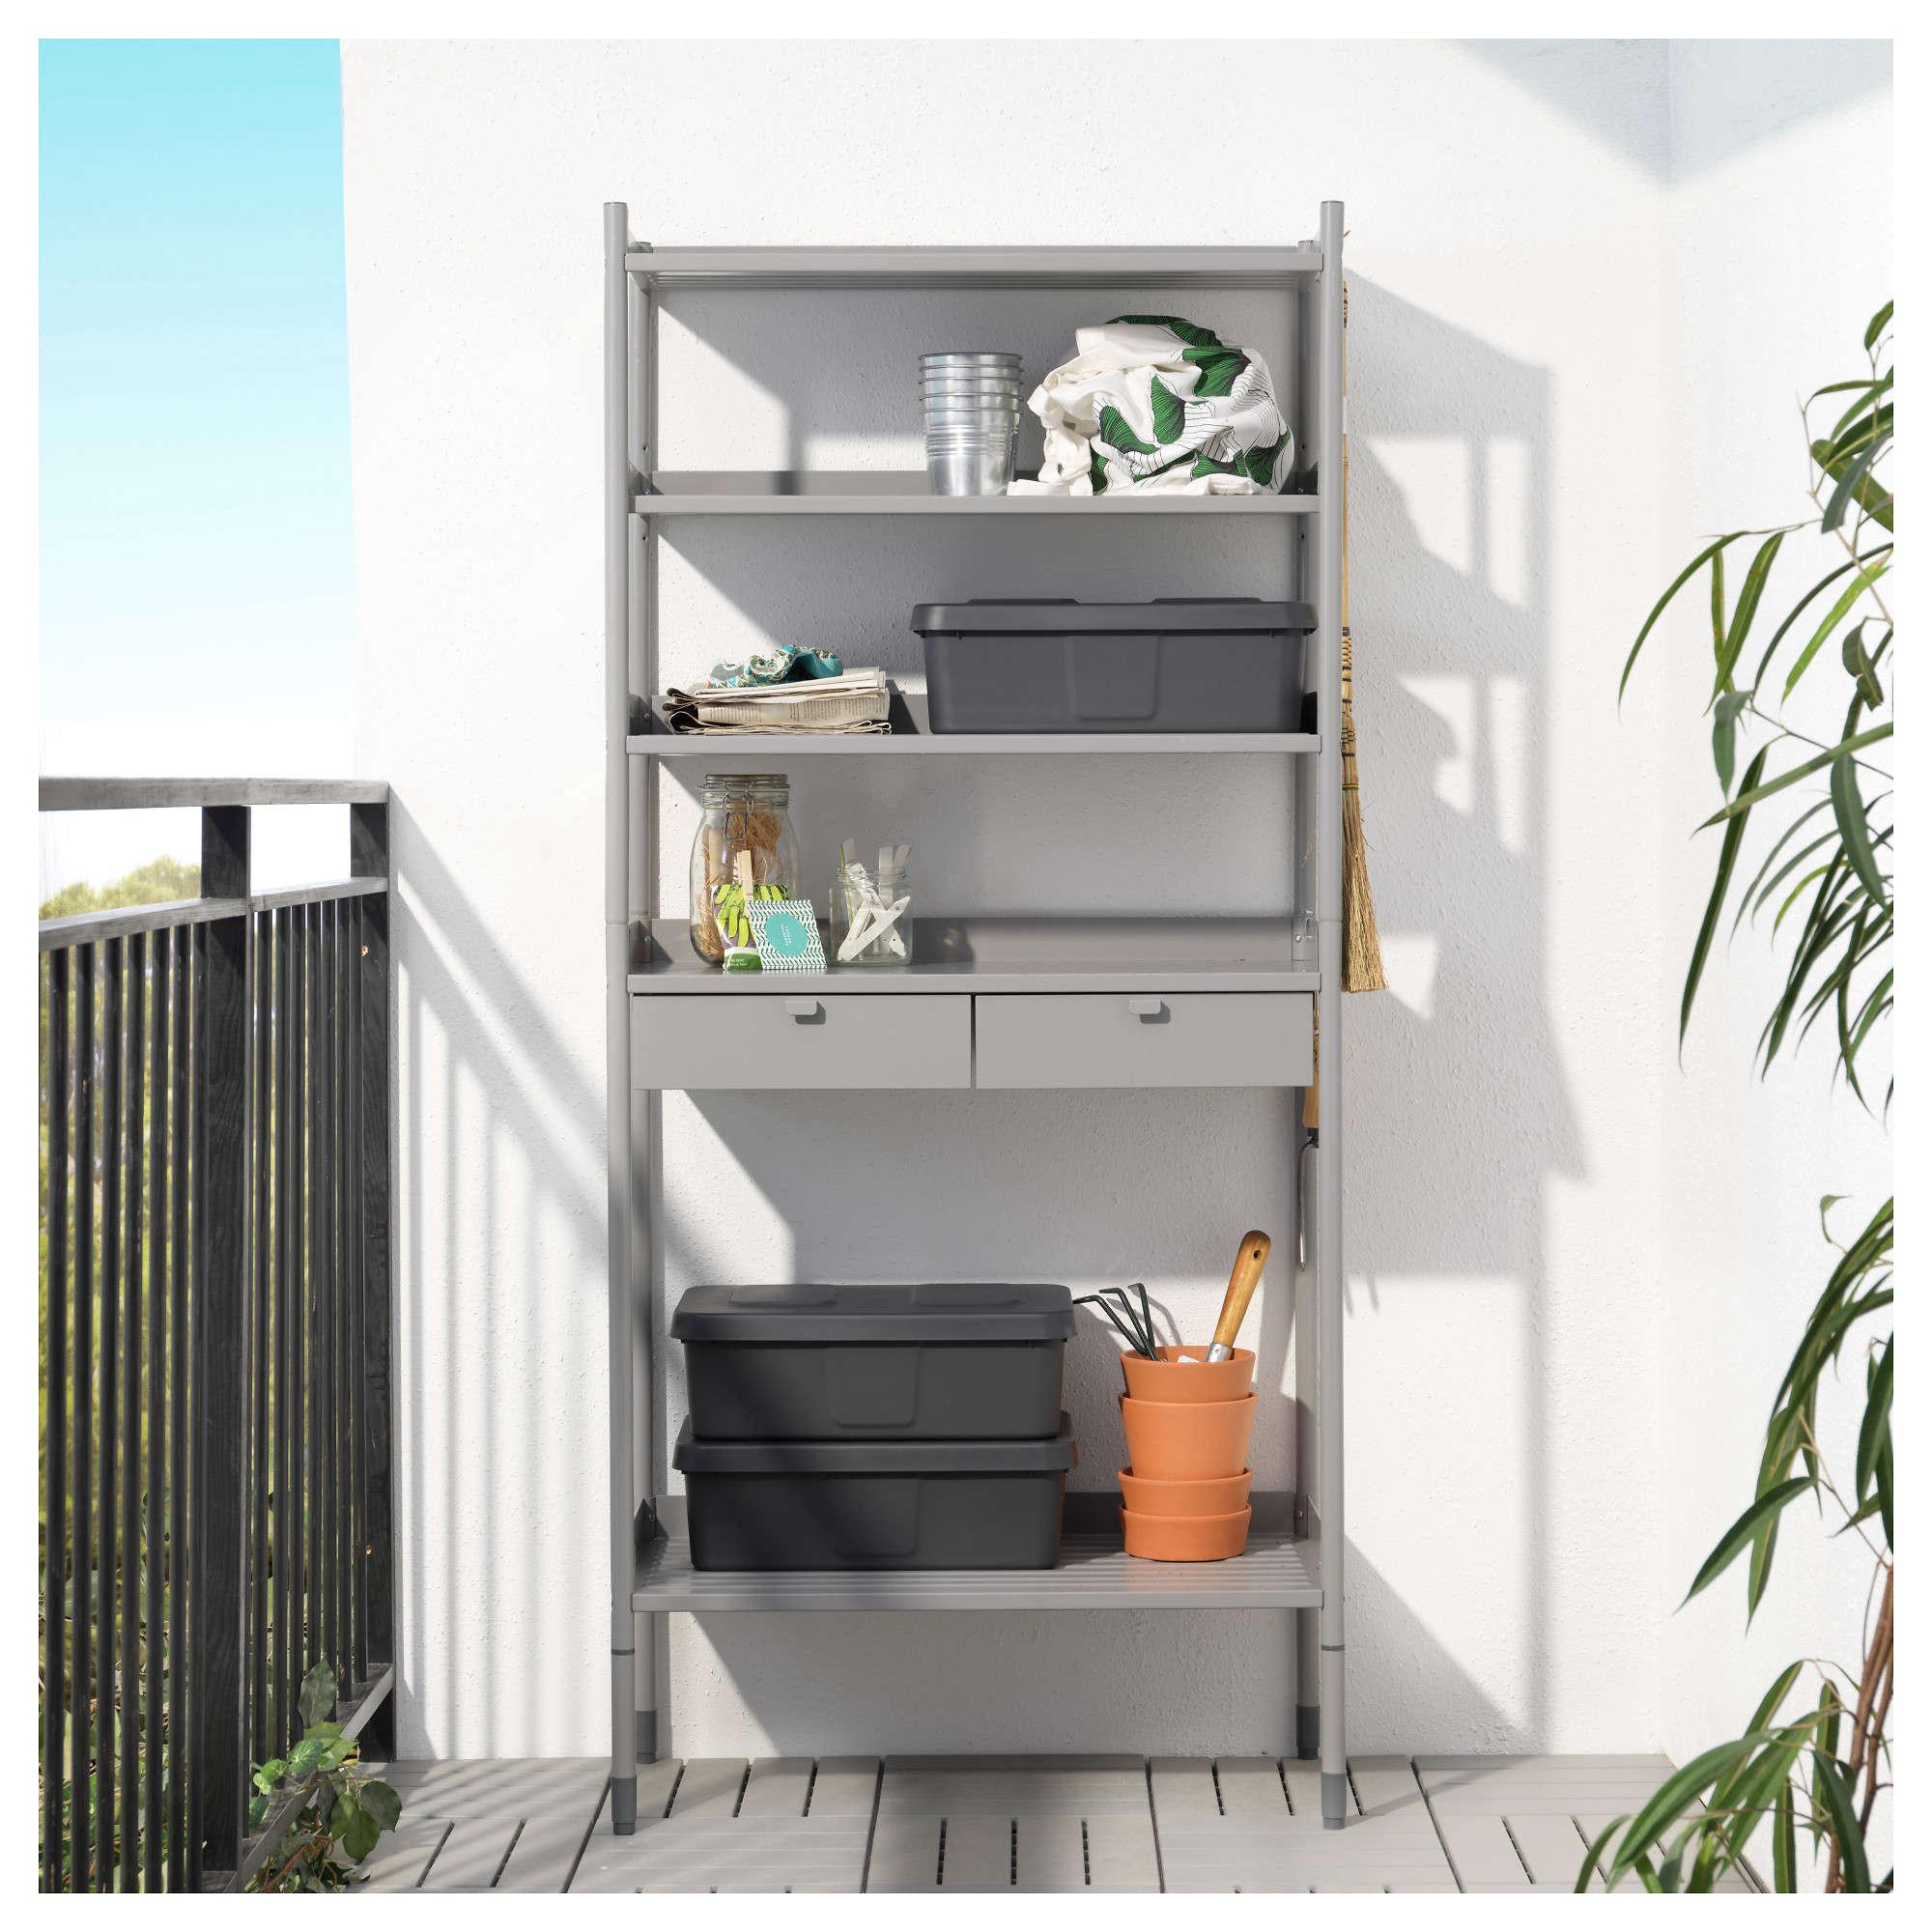 Ikea Jardin Muebles Roubaix Maison Design Trivid Us # Mueble Toallero Ikea